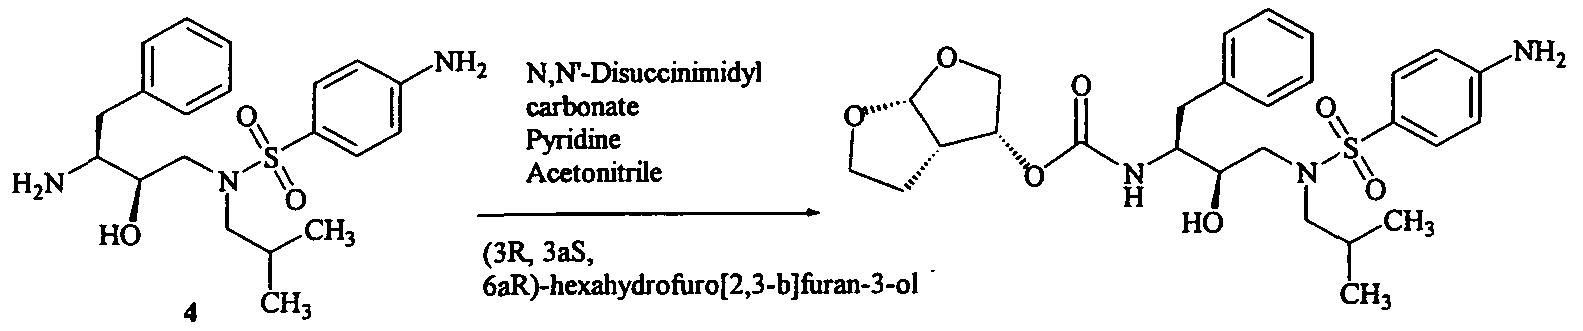 Cross-reactivity between darunavir and trimethoprim ...